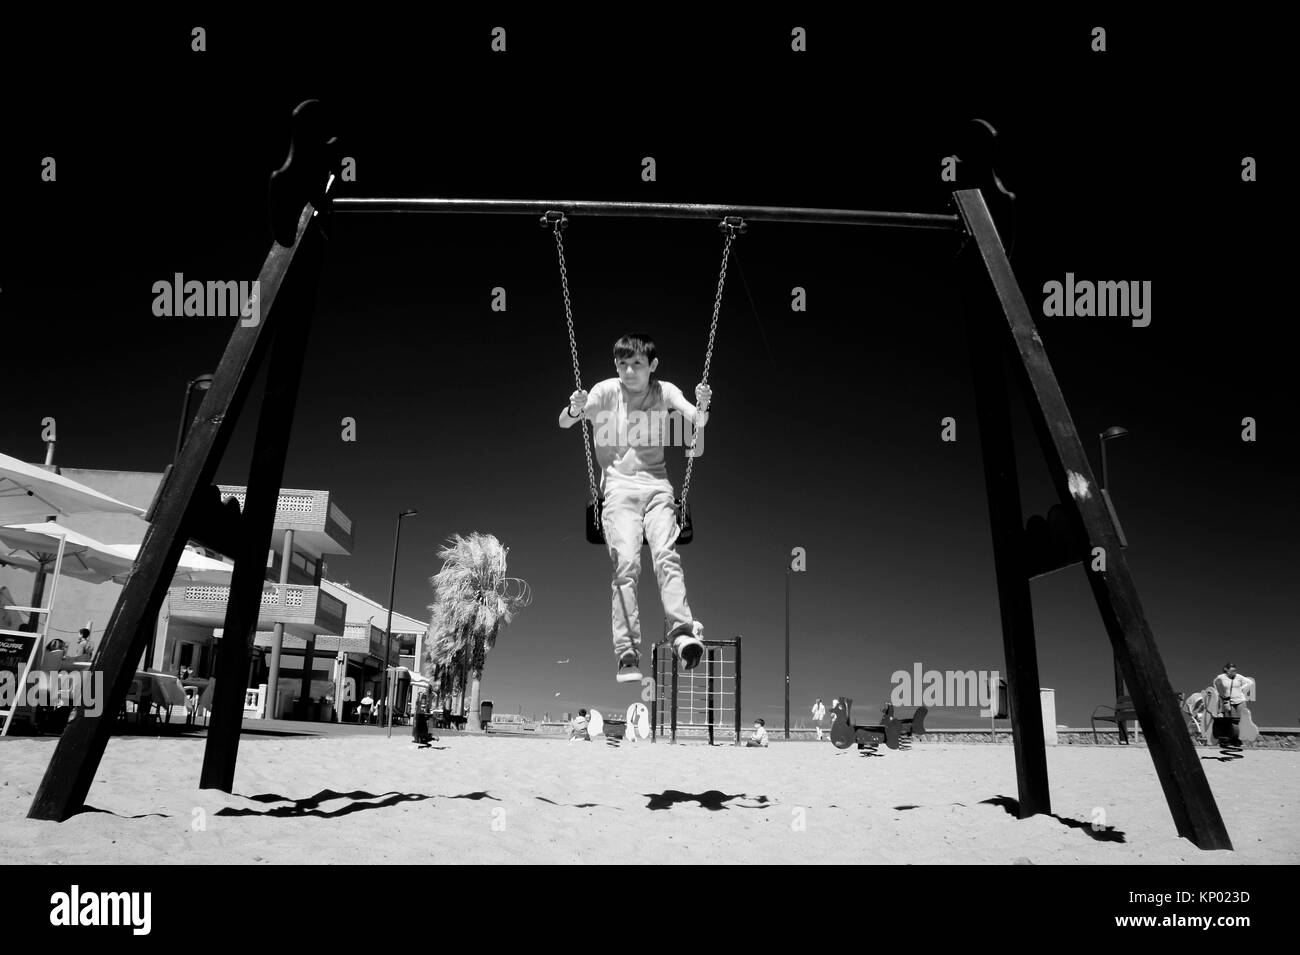 Child swinging in Castellon, Spain. - Stock Image